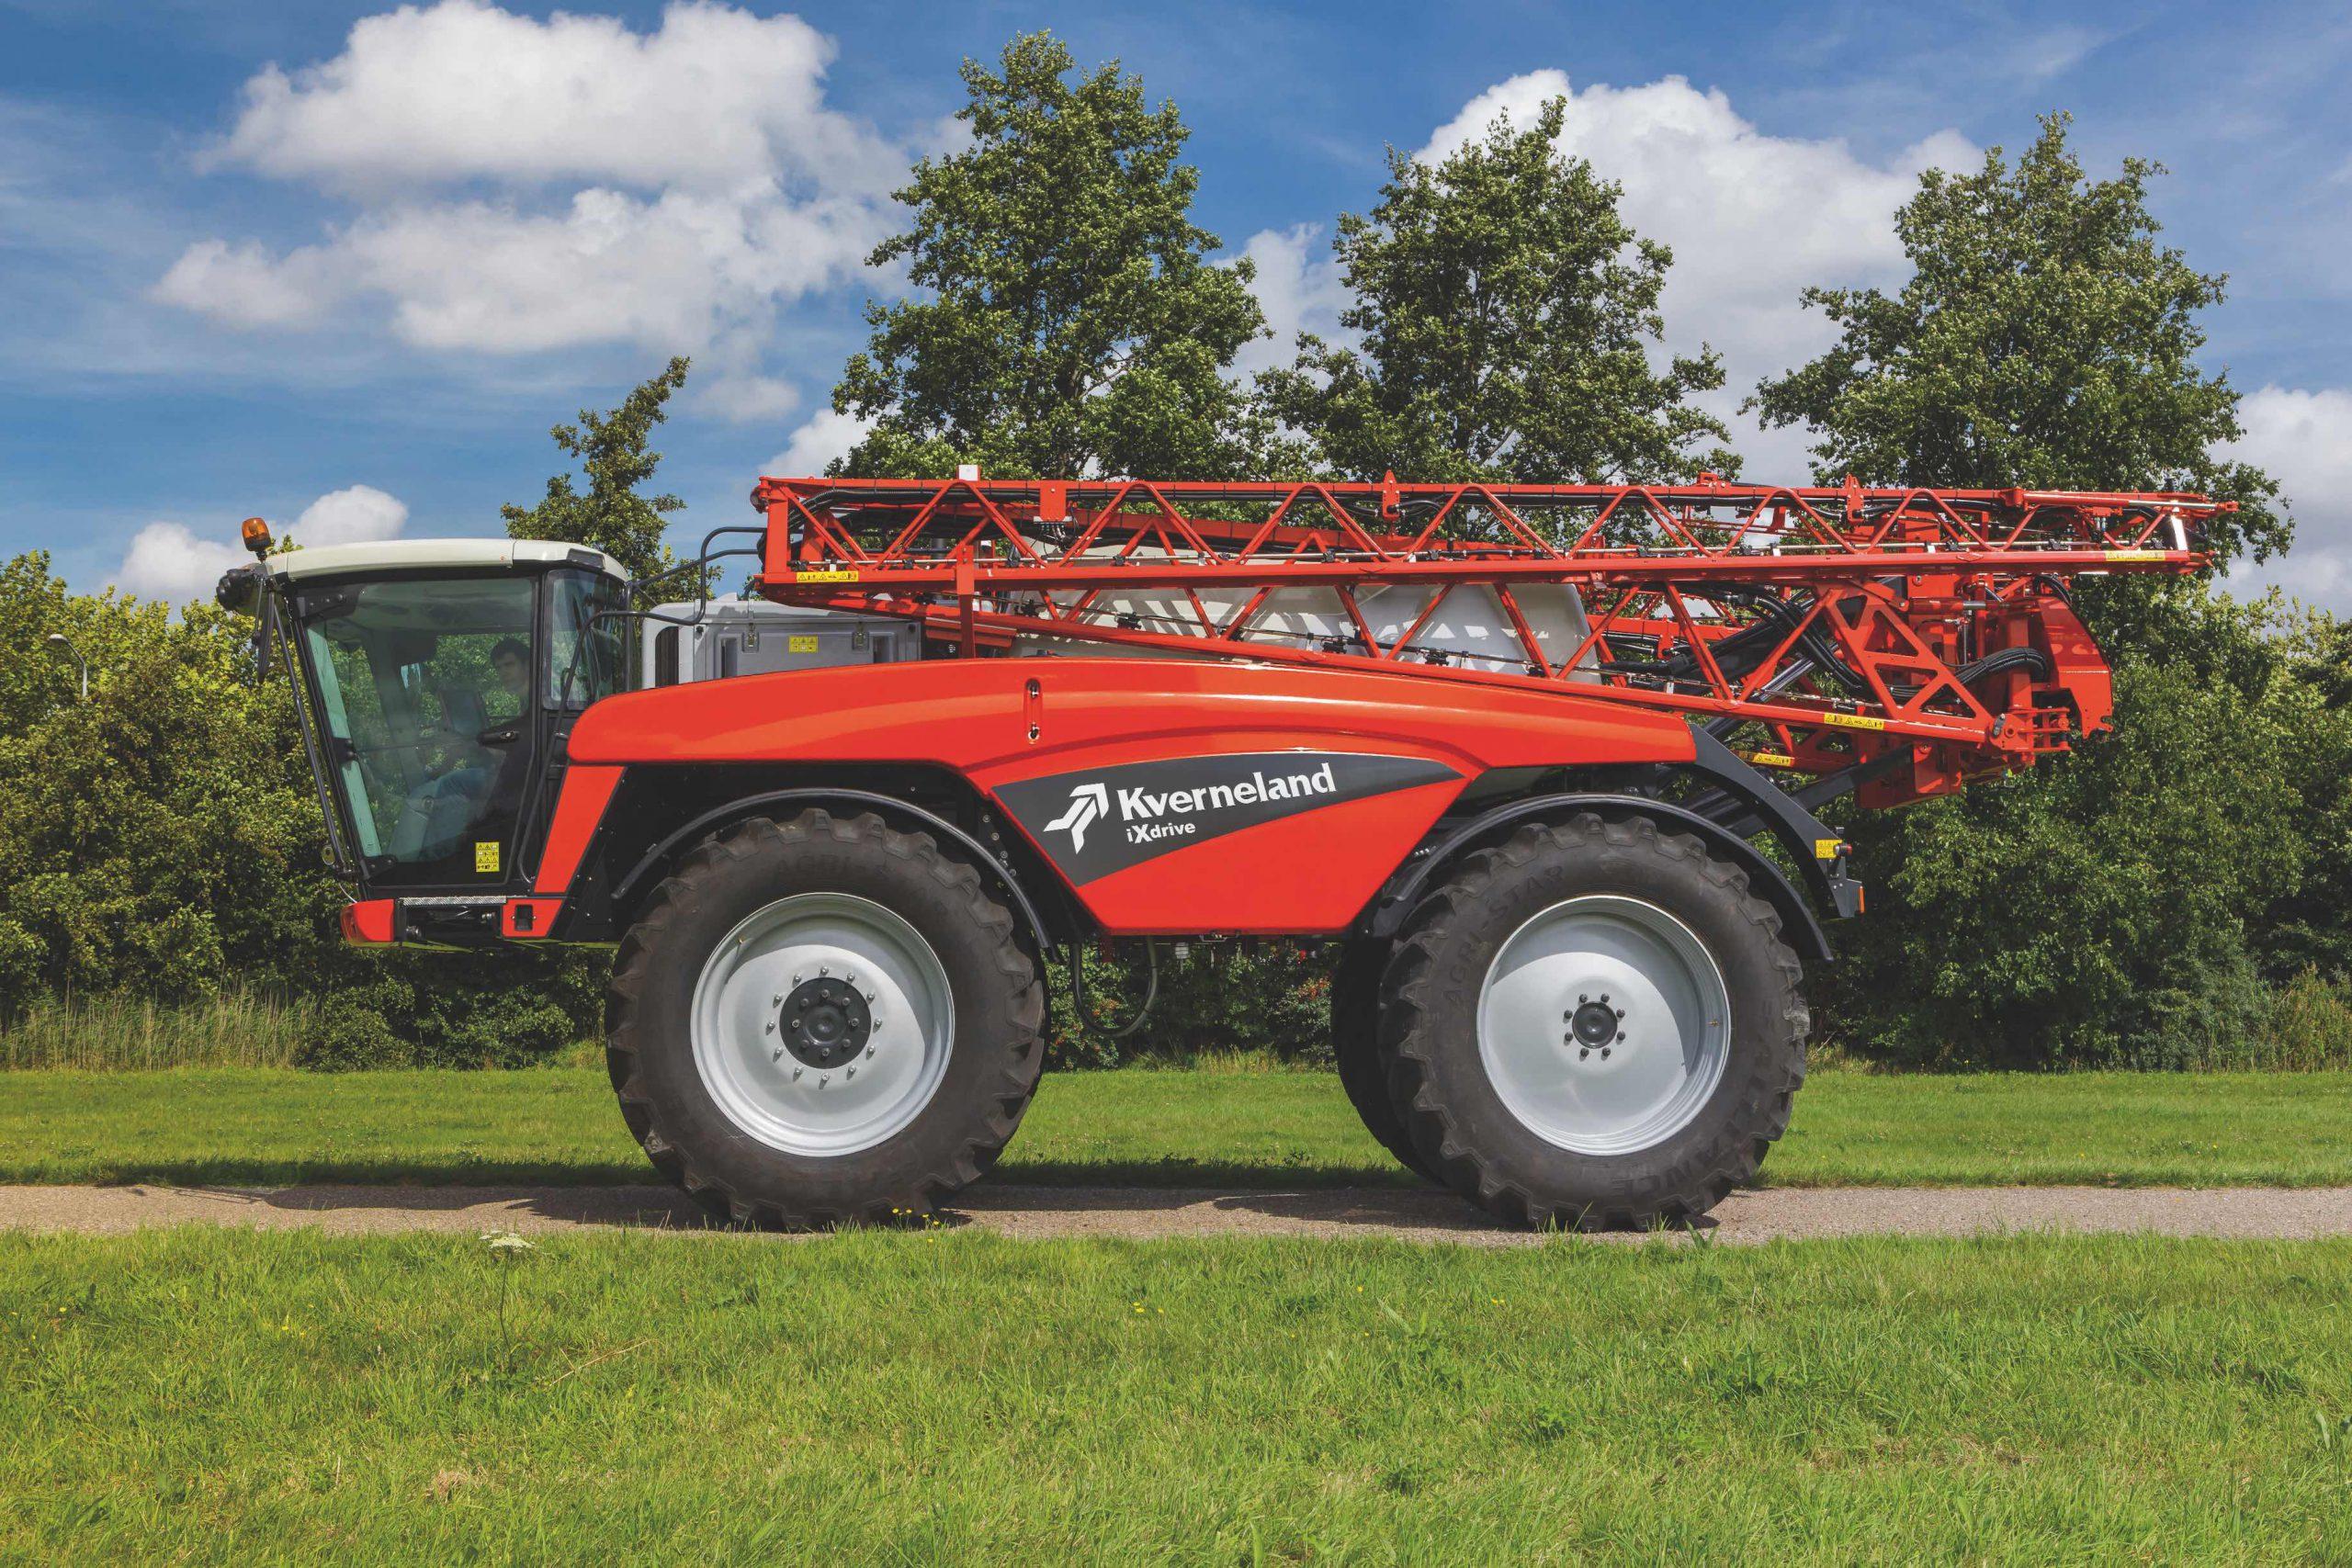 Kverneland Group rinnova la partnership con Mazzotti